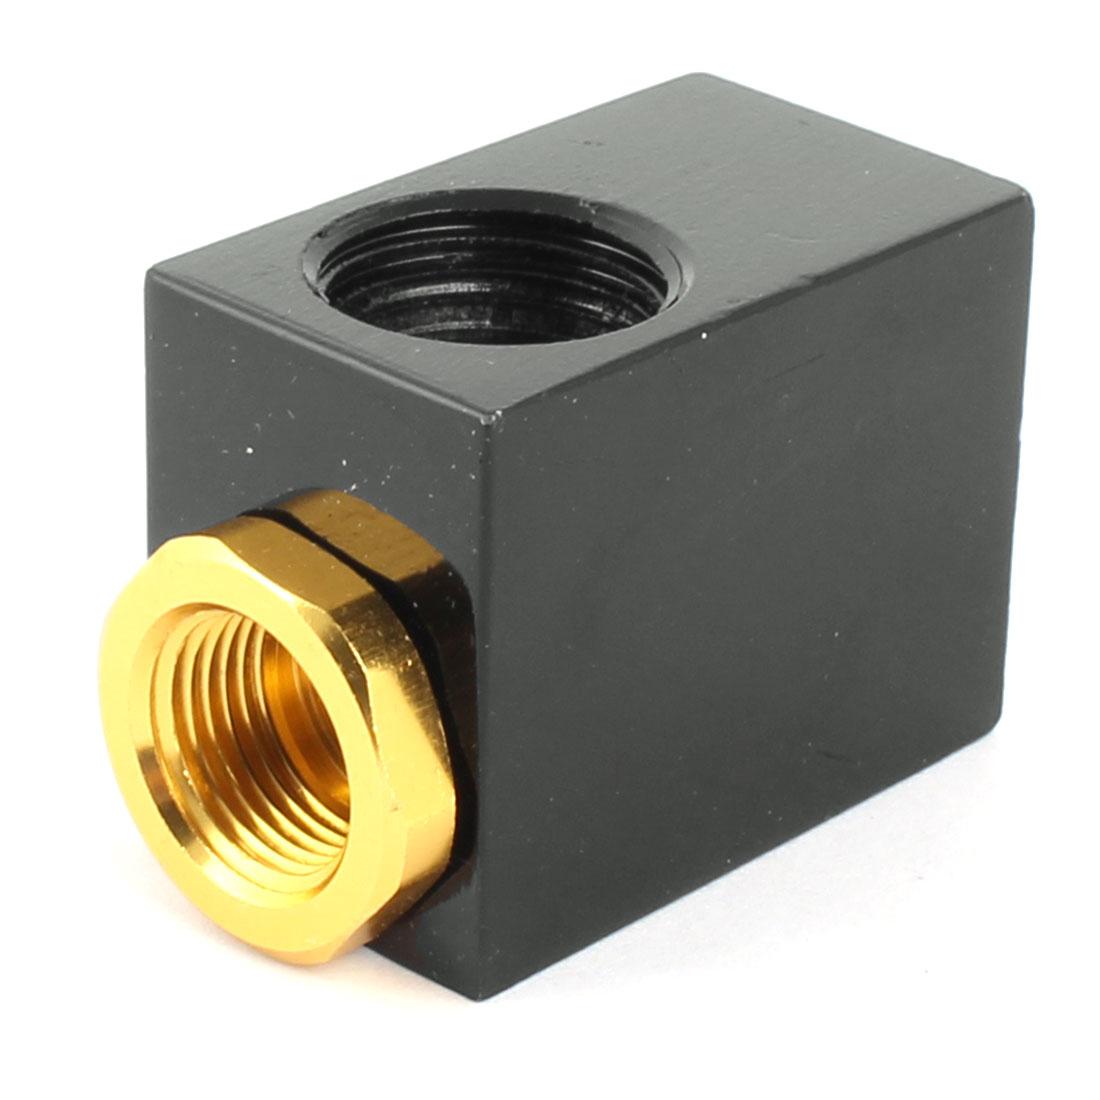 "Pneumatic QE-04 1/2BSP 3/4"" 19mm Inlet 2 Ports Air Quick Exhaust Valve"